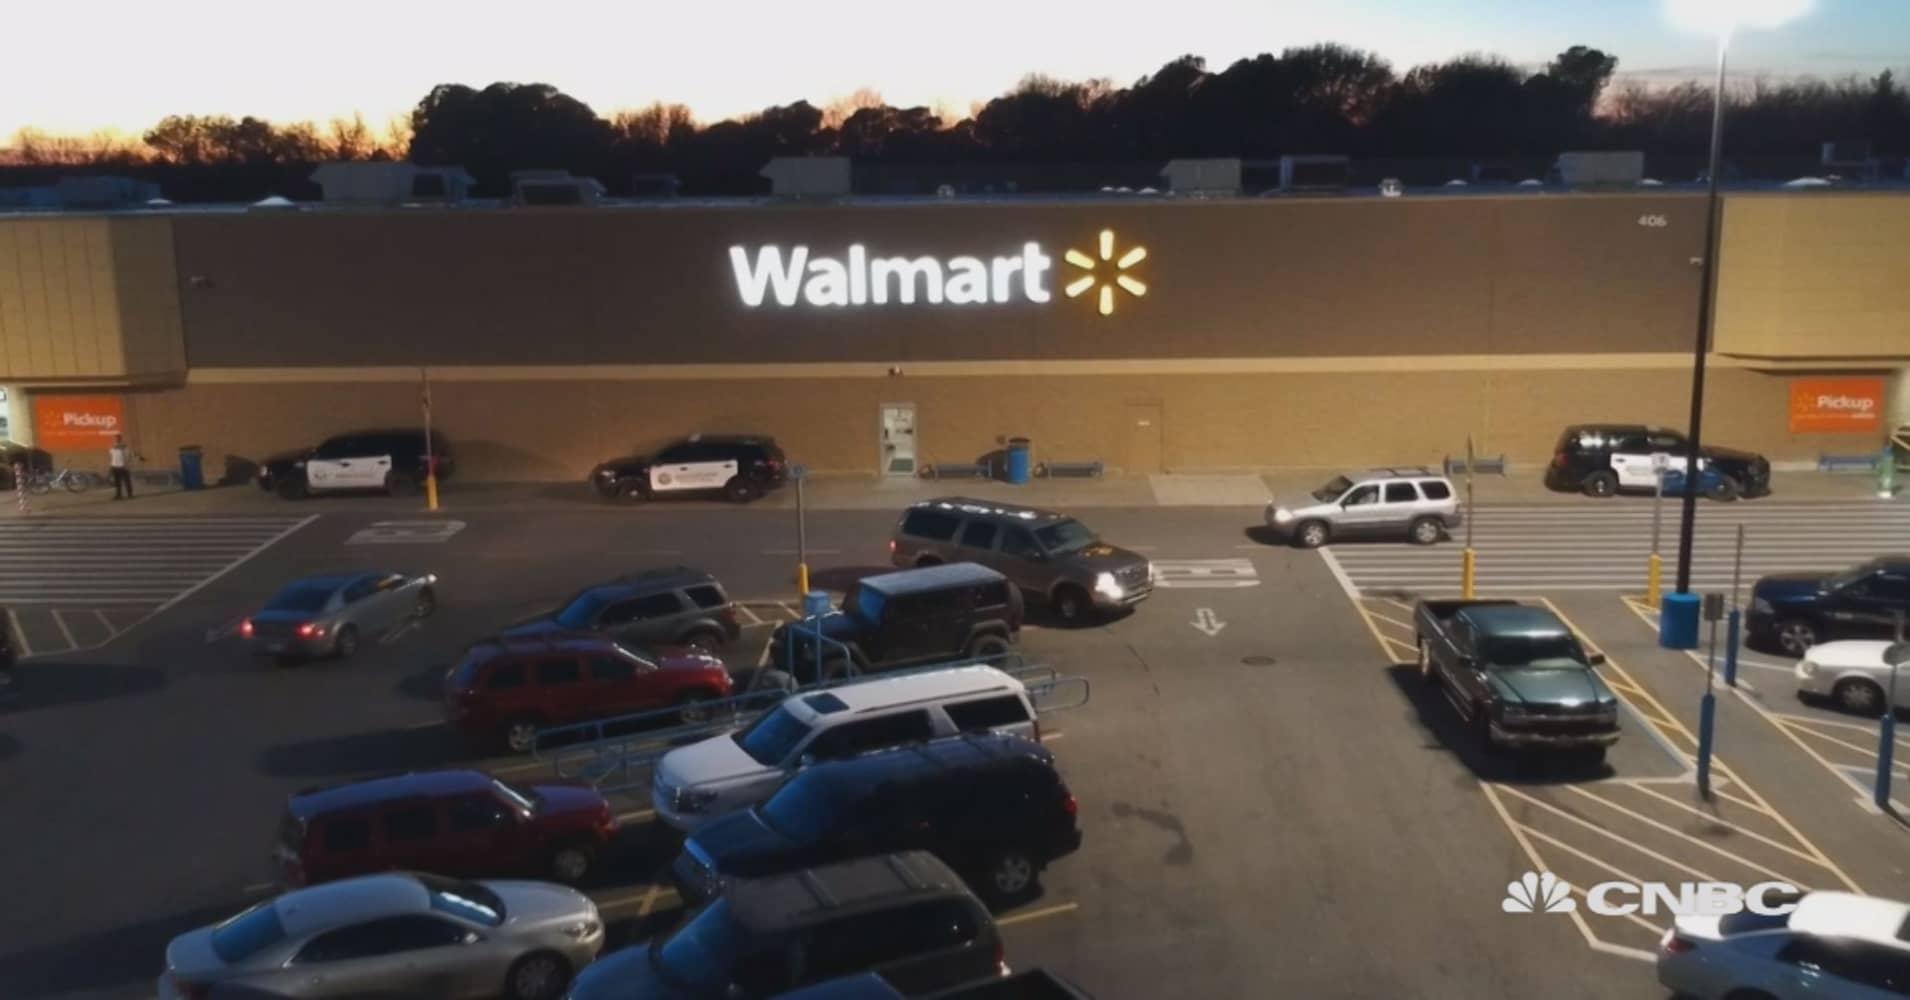 Walmart announces bonusesen sheds stores and jobs malvernweather Gallery